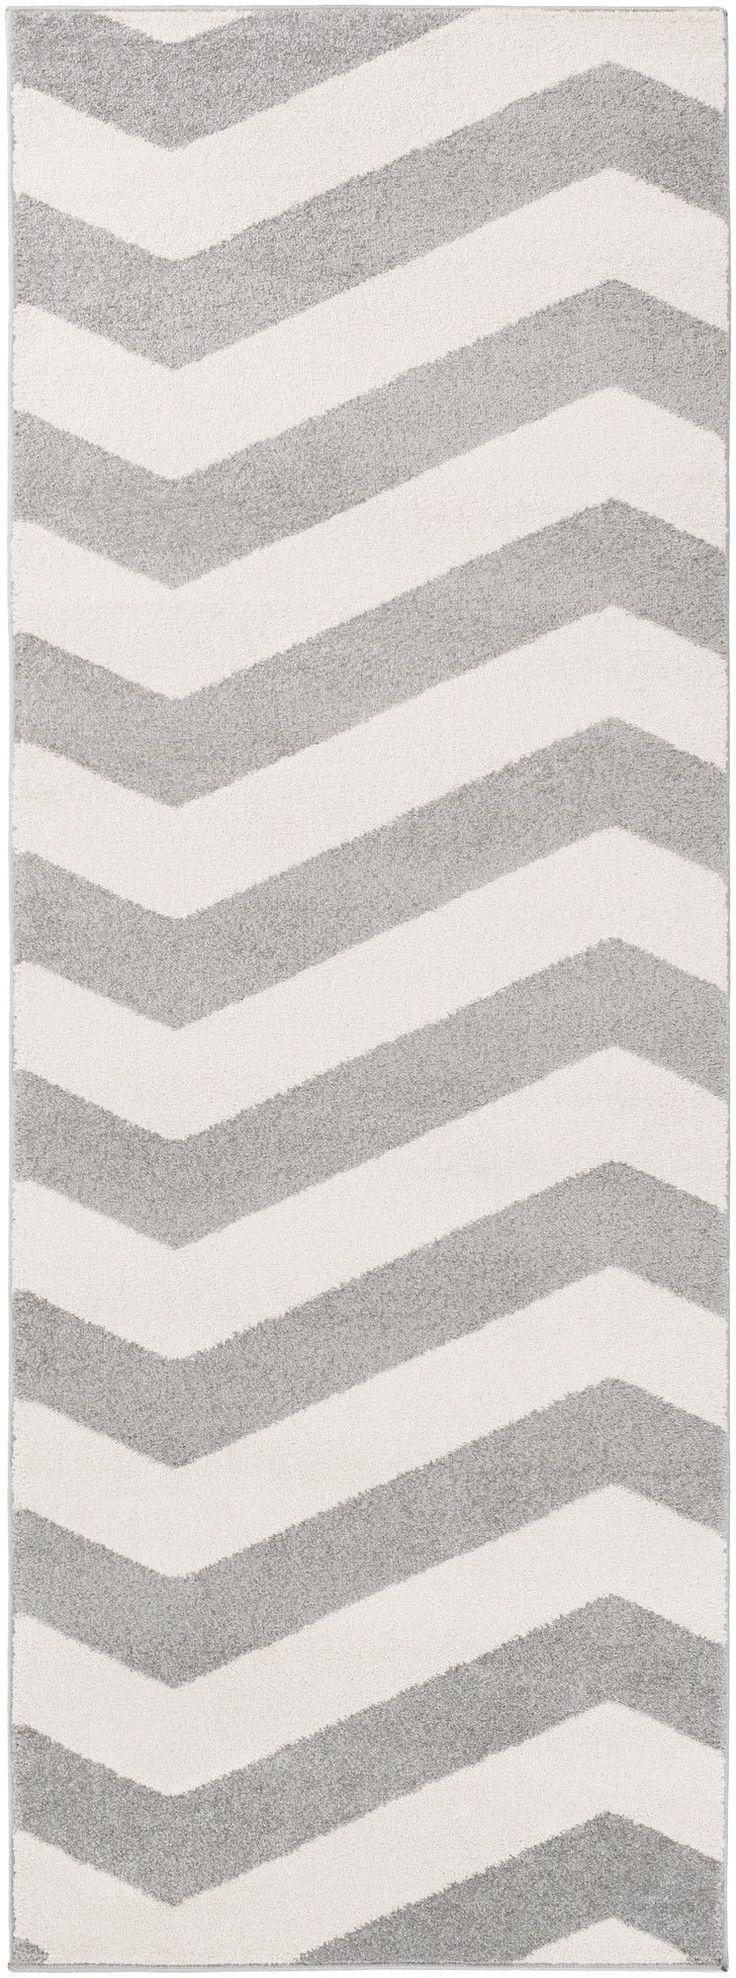 Horizon Ivory and Grey Chevron Area Rug